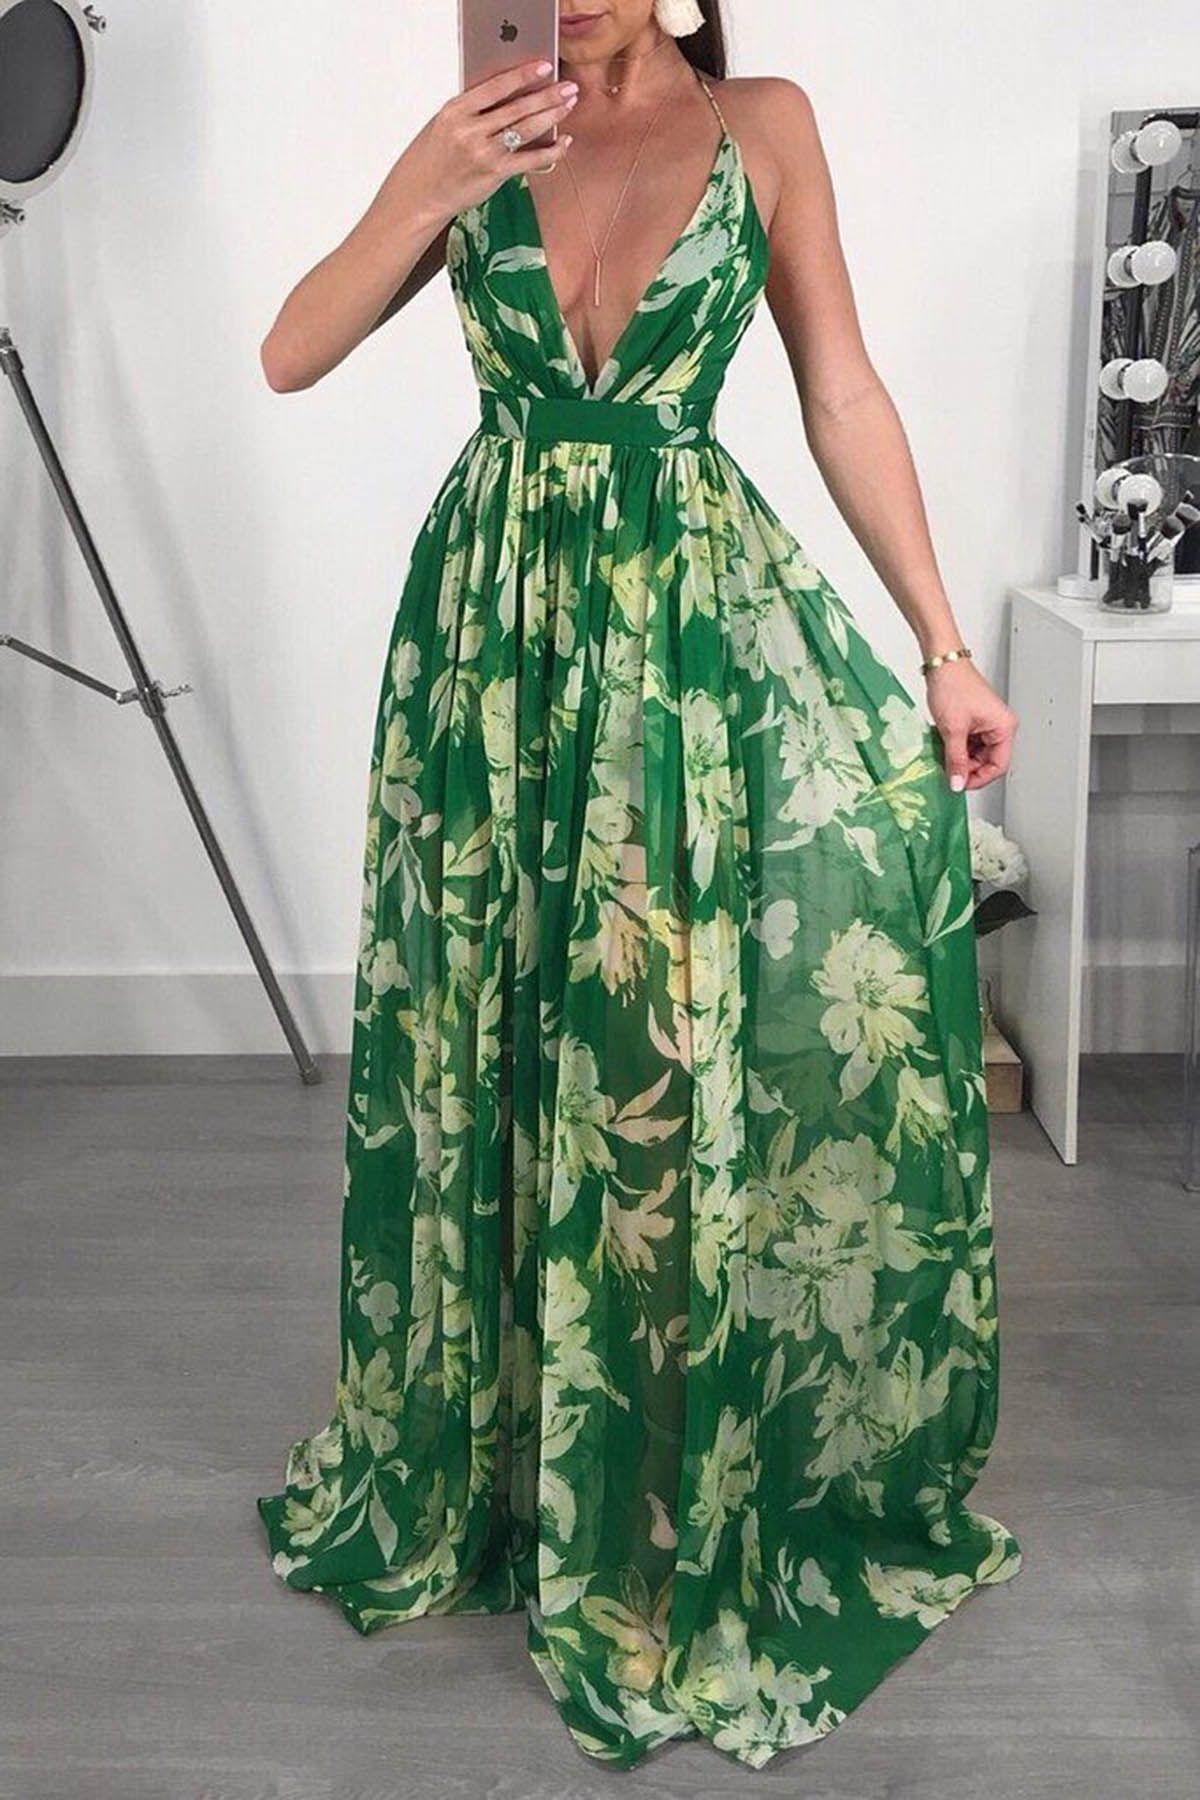 Green Floral Chiffon V Neck Long Summer Prom Dress Long Summer Dresses Maxi Dress Chiffon Dress Long [ 1800 x 1200 Pixel ]